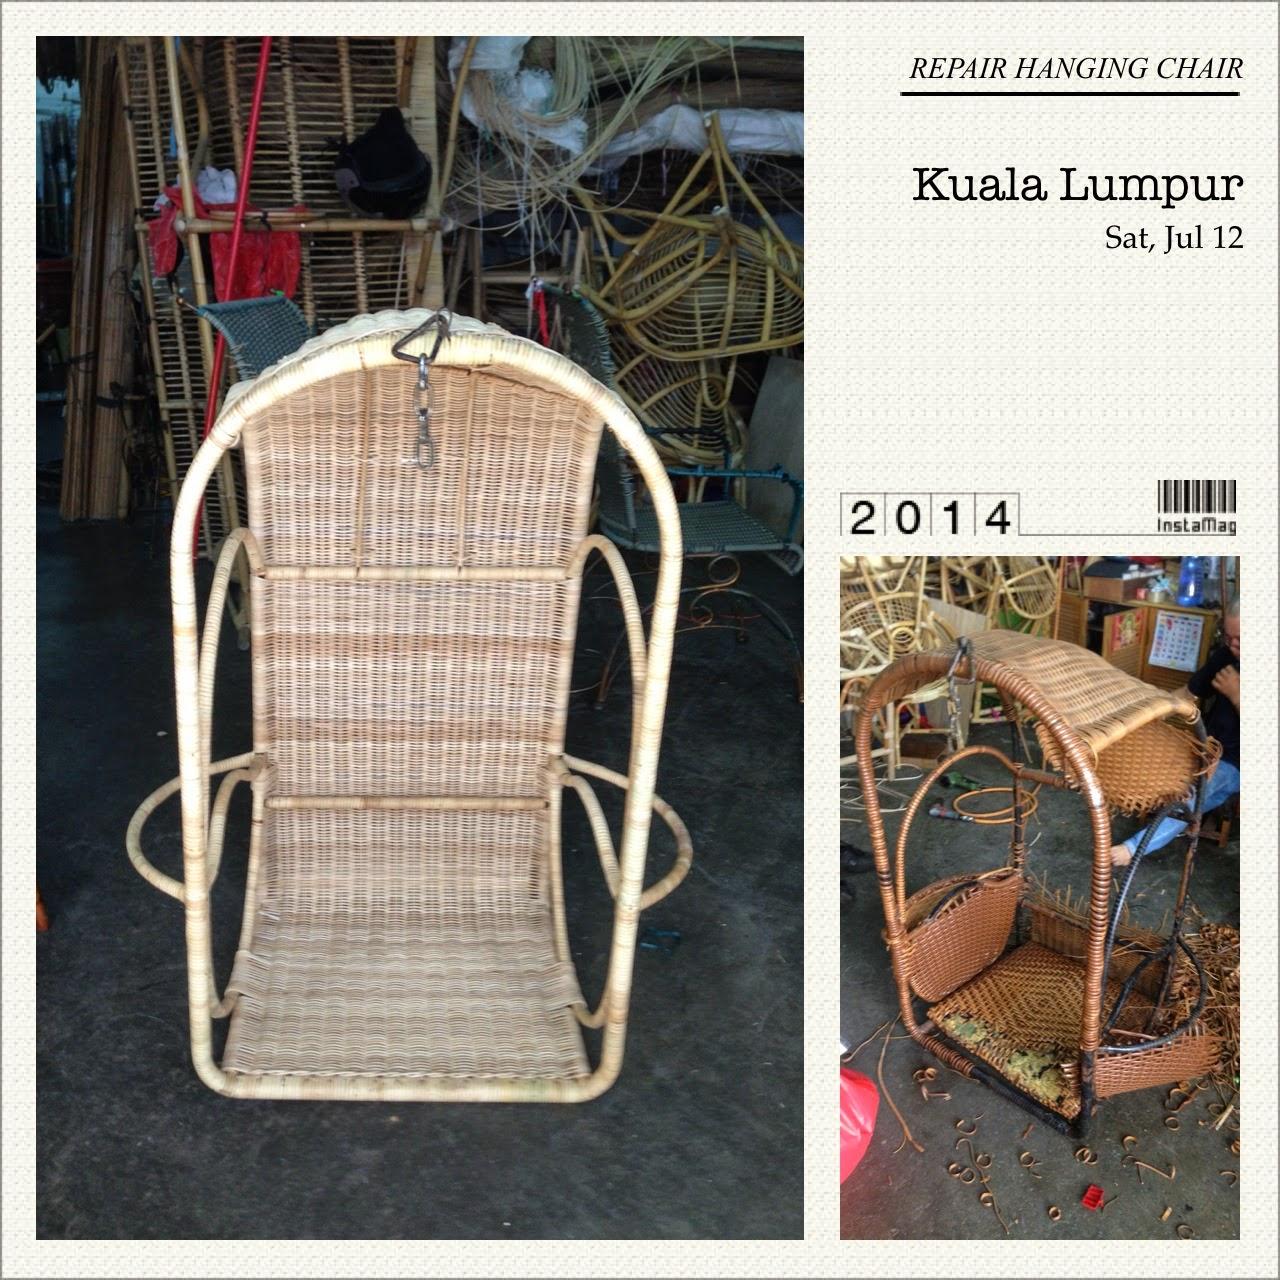 Repair Rattan Furniture, Rattan Sofa, Cane/Wicker Chair, Wood Chair In  Malaysia